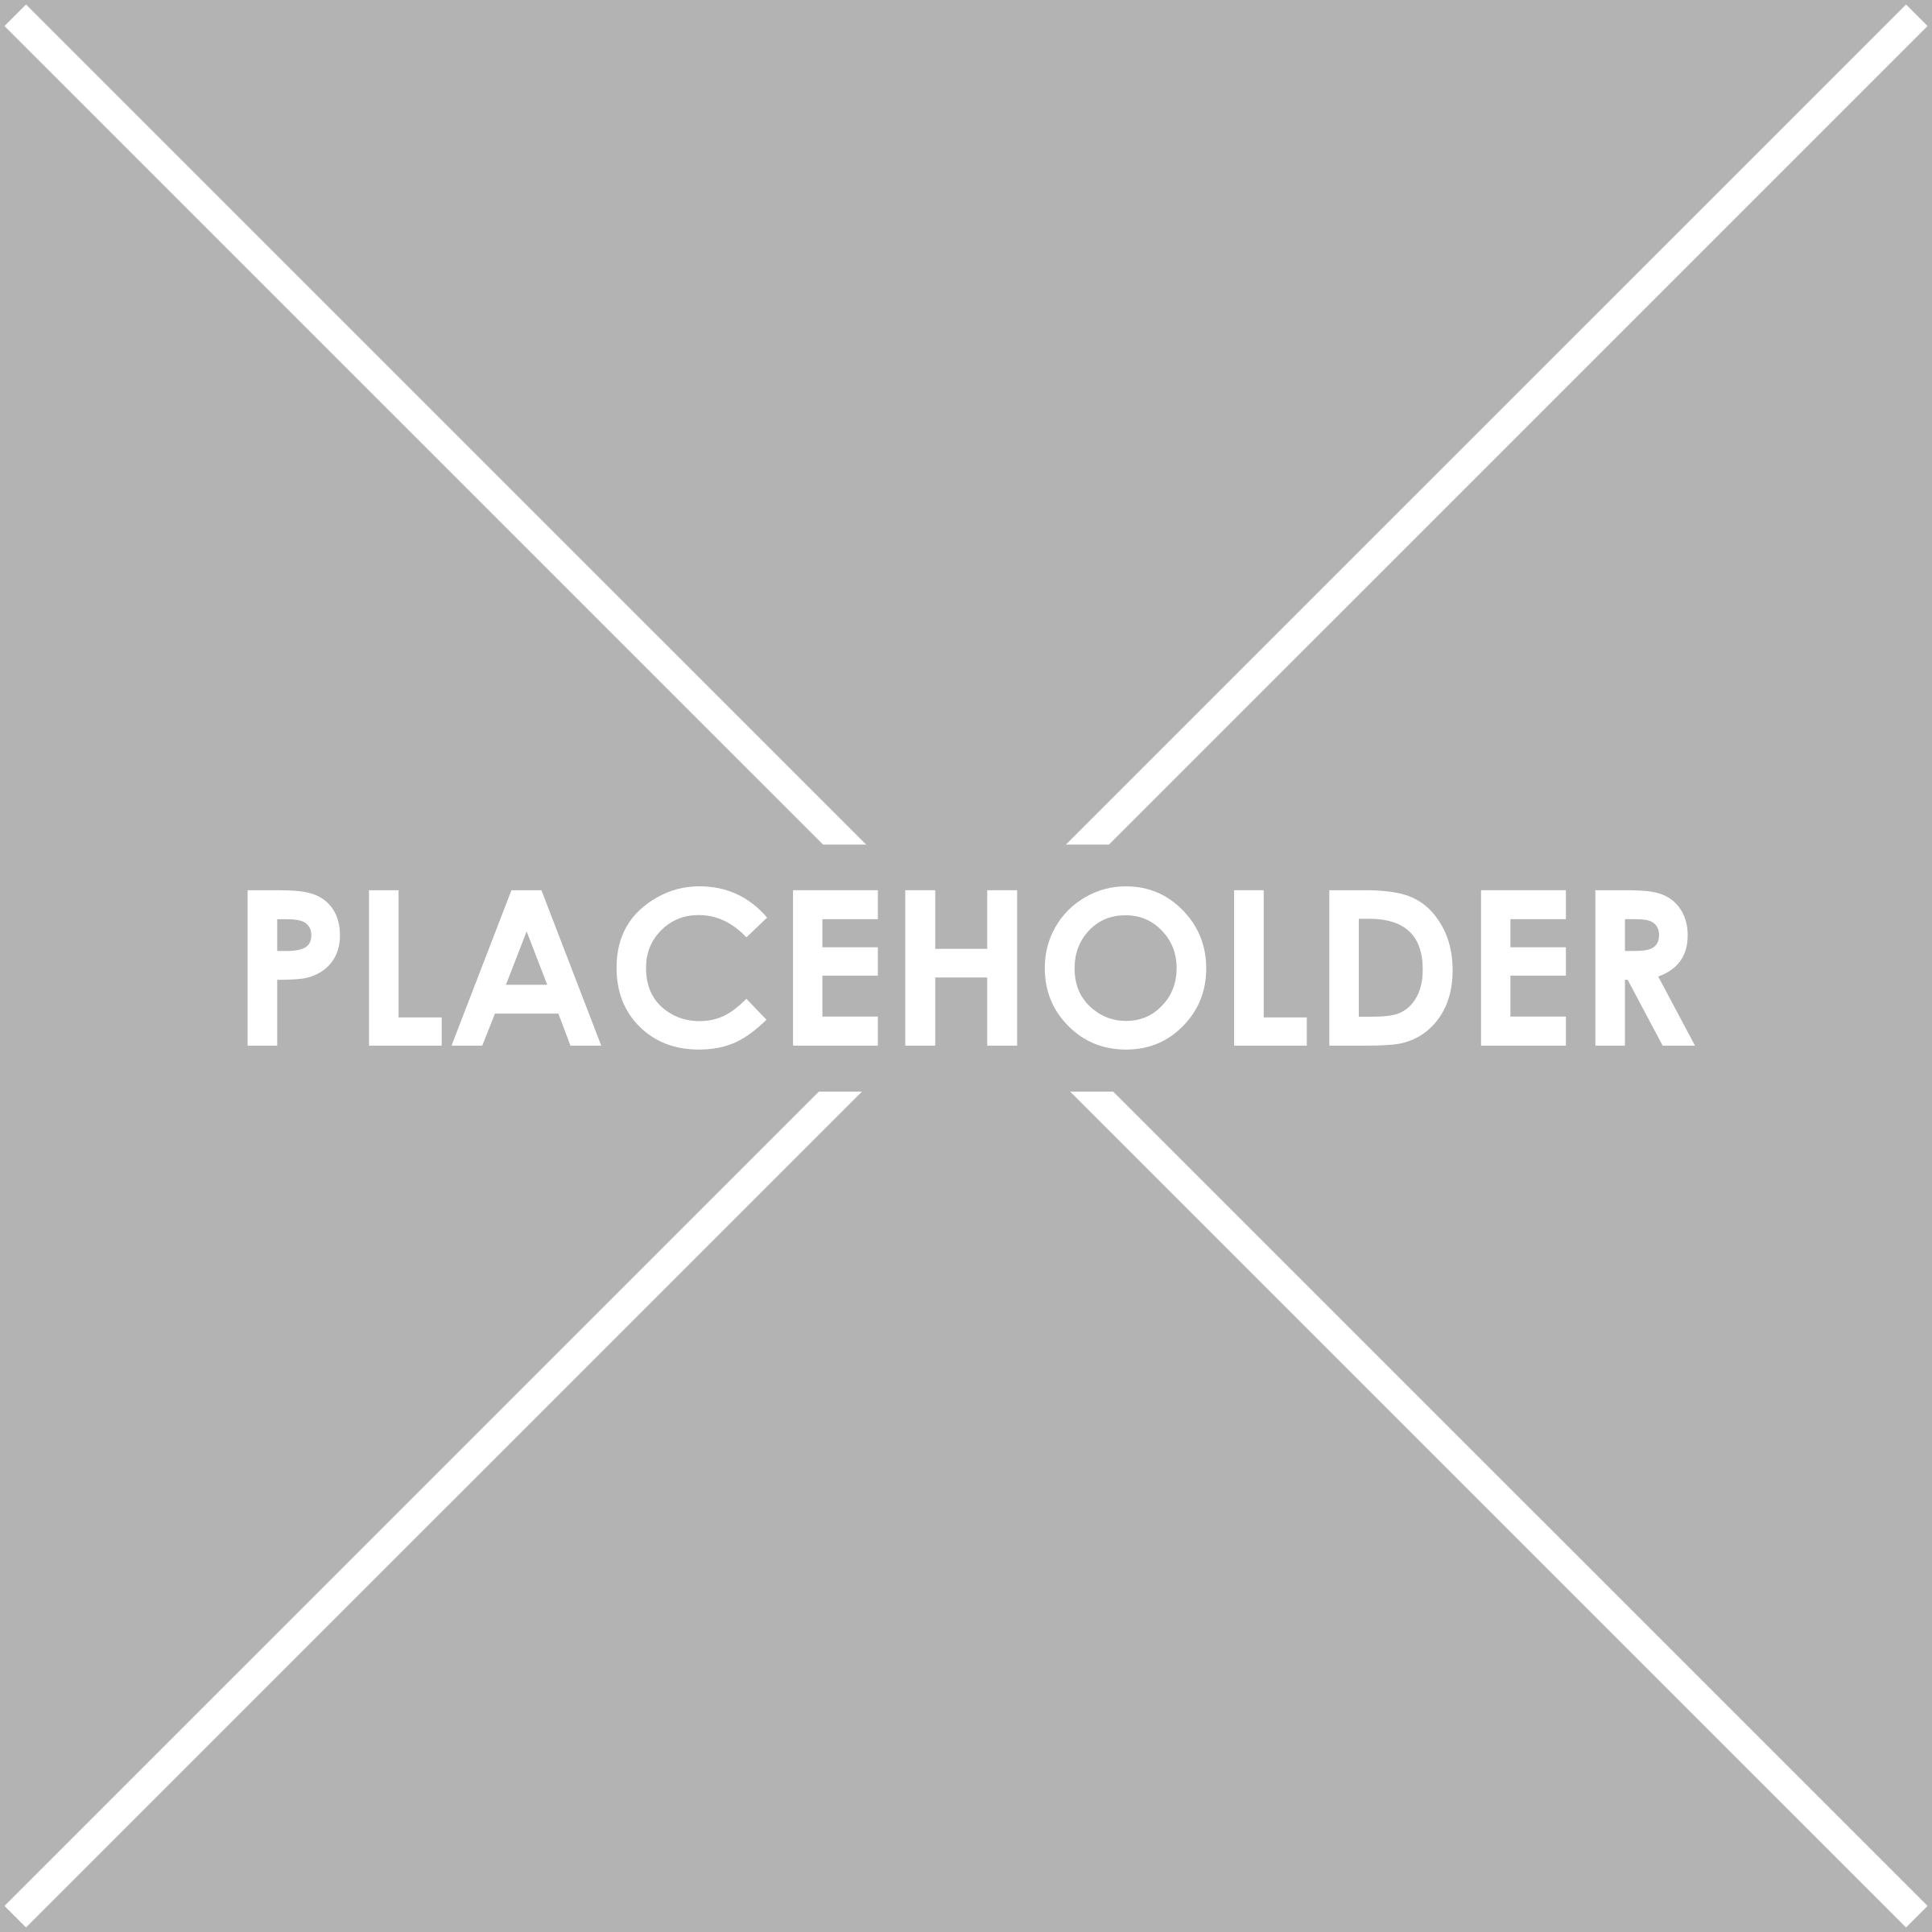 Placeholder copy 4.png